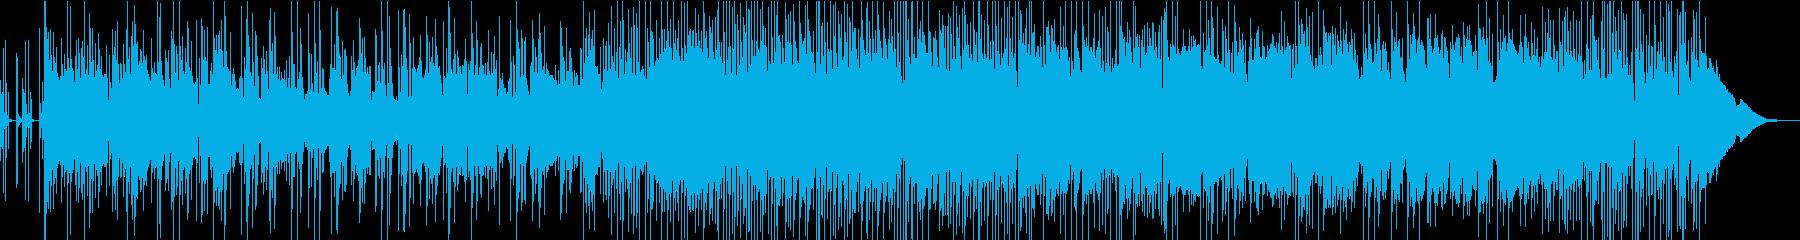 EDMアレンジのアジアンポップの再生済みの波形